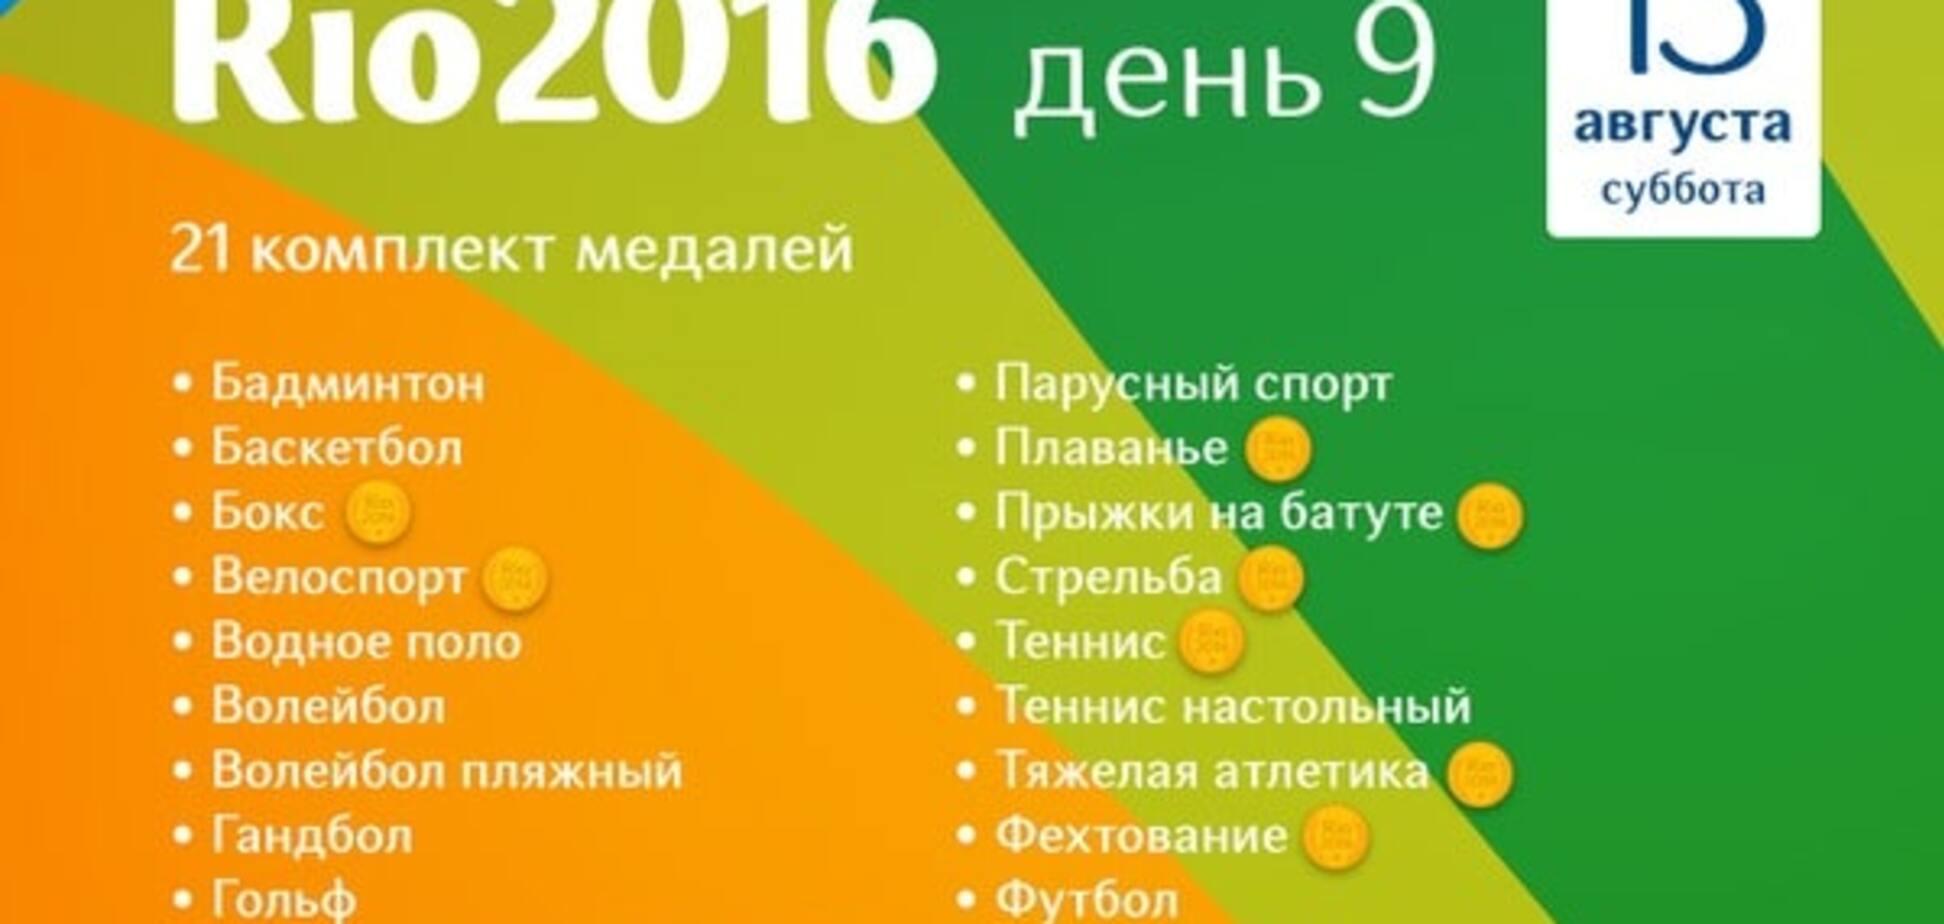 Олимпиада-2016 где смотреть